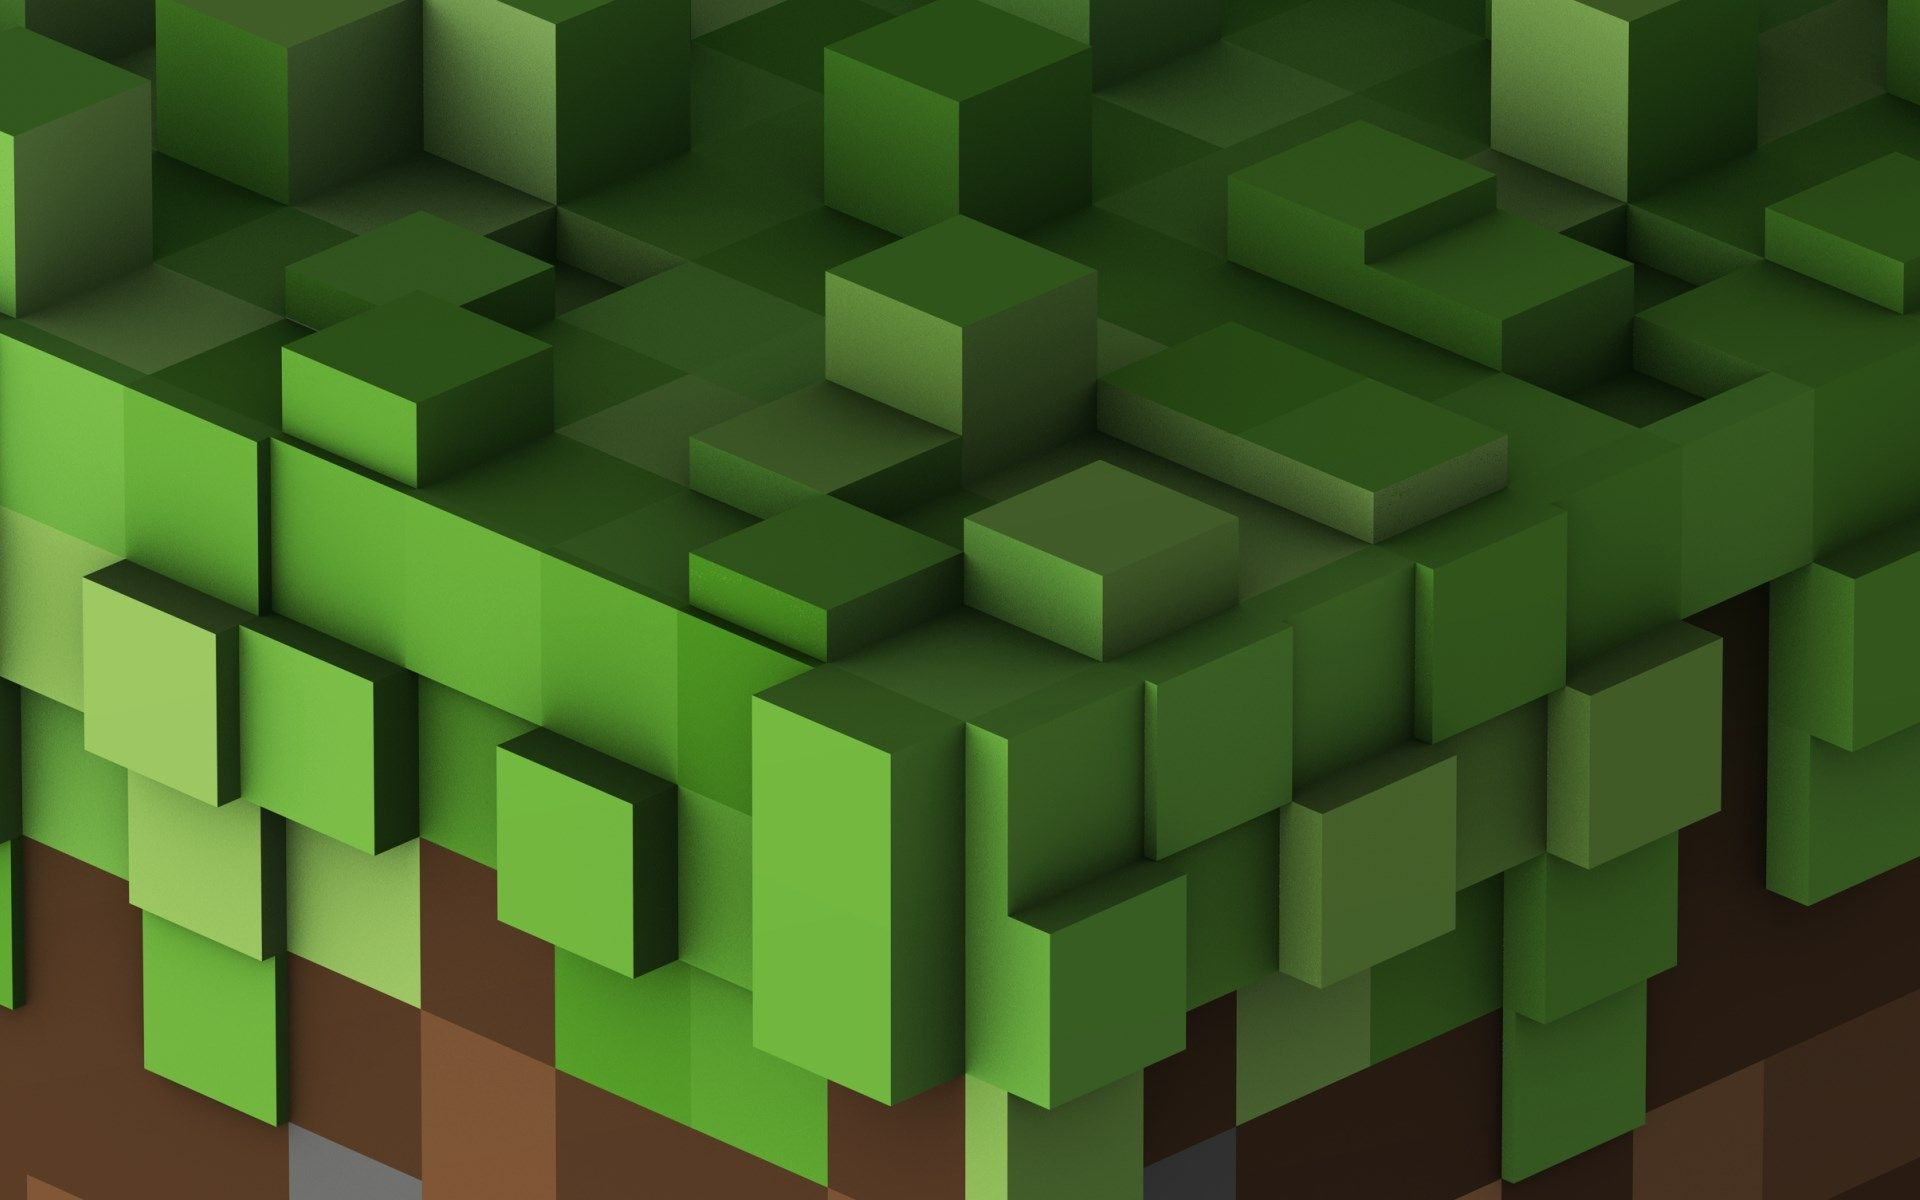 Cool Wallpaper Minecraft Zombie Pigman - be99b27774c249ce6293c5c9300c1b2e  Snapshot_386018.jpg